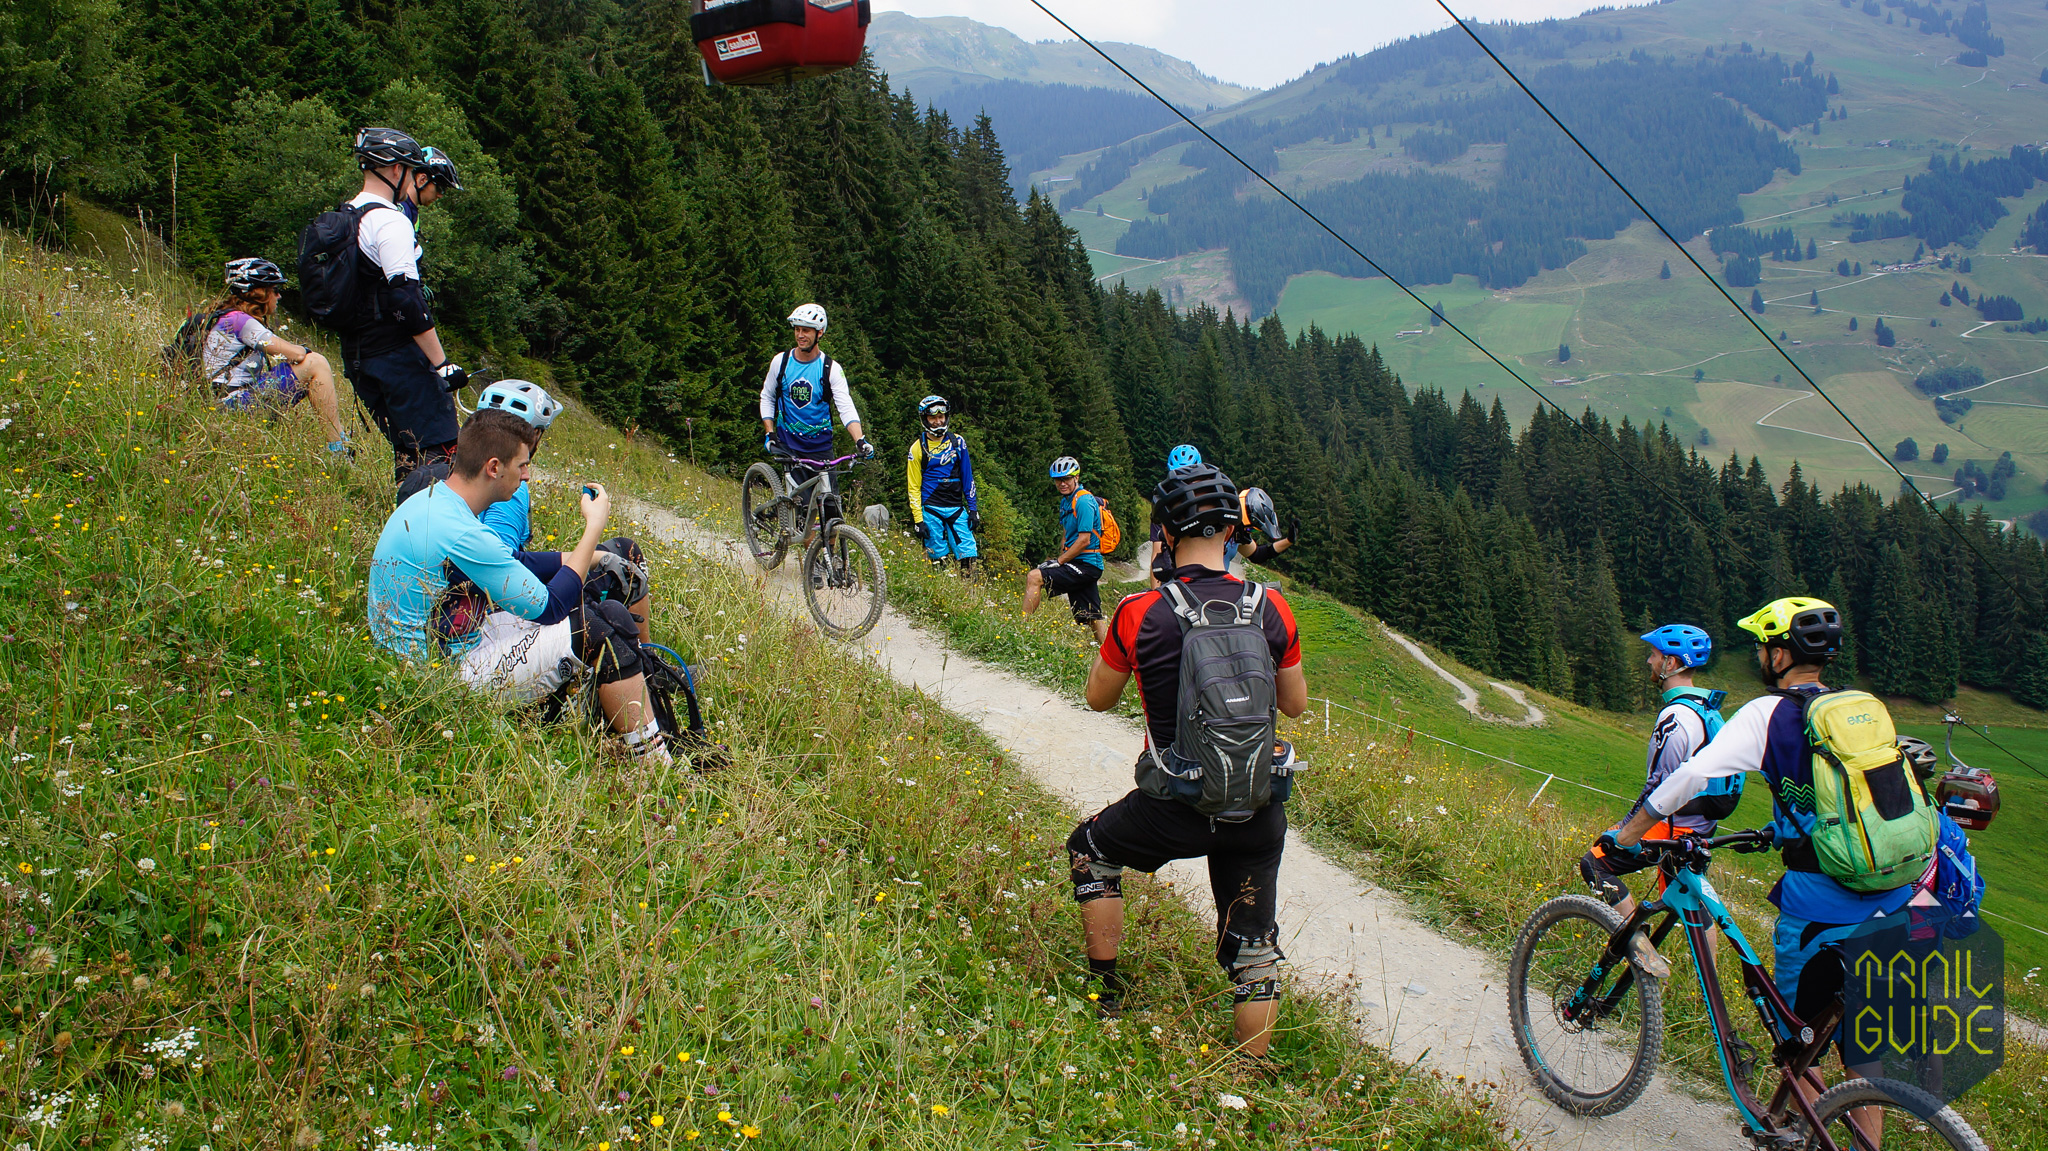 Trail-Guide_Saalbach_lanovka_gtgj5q.jpg